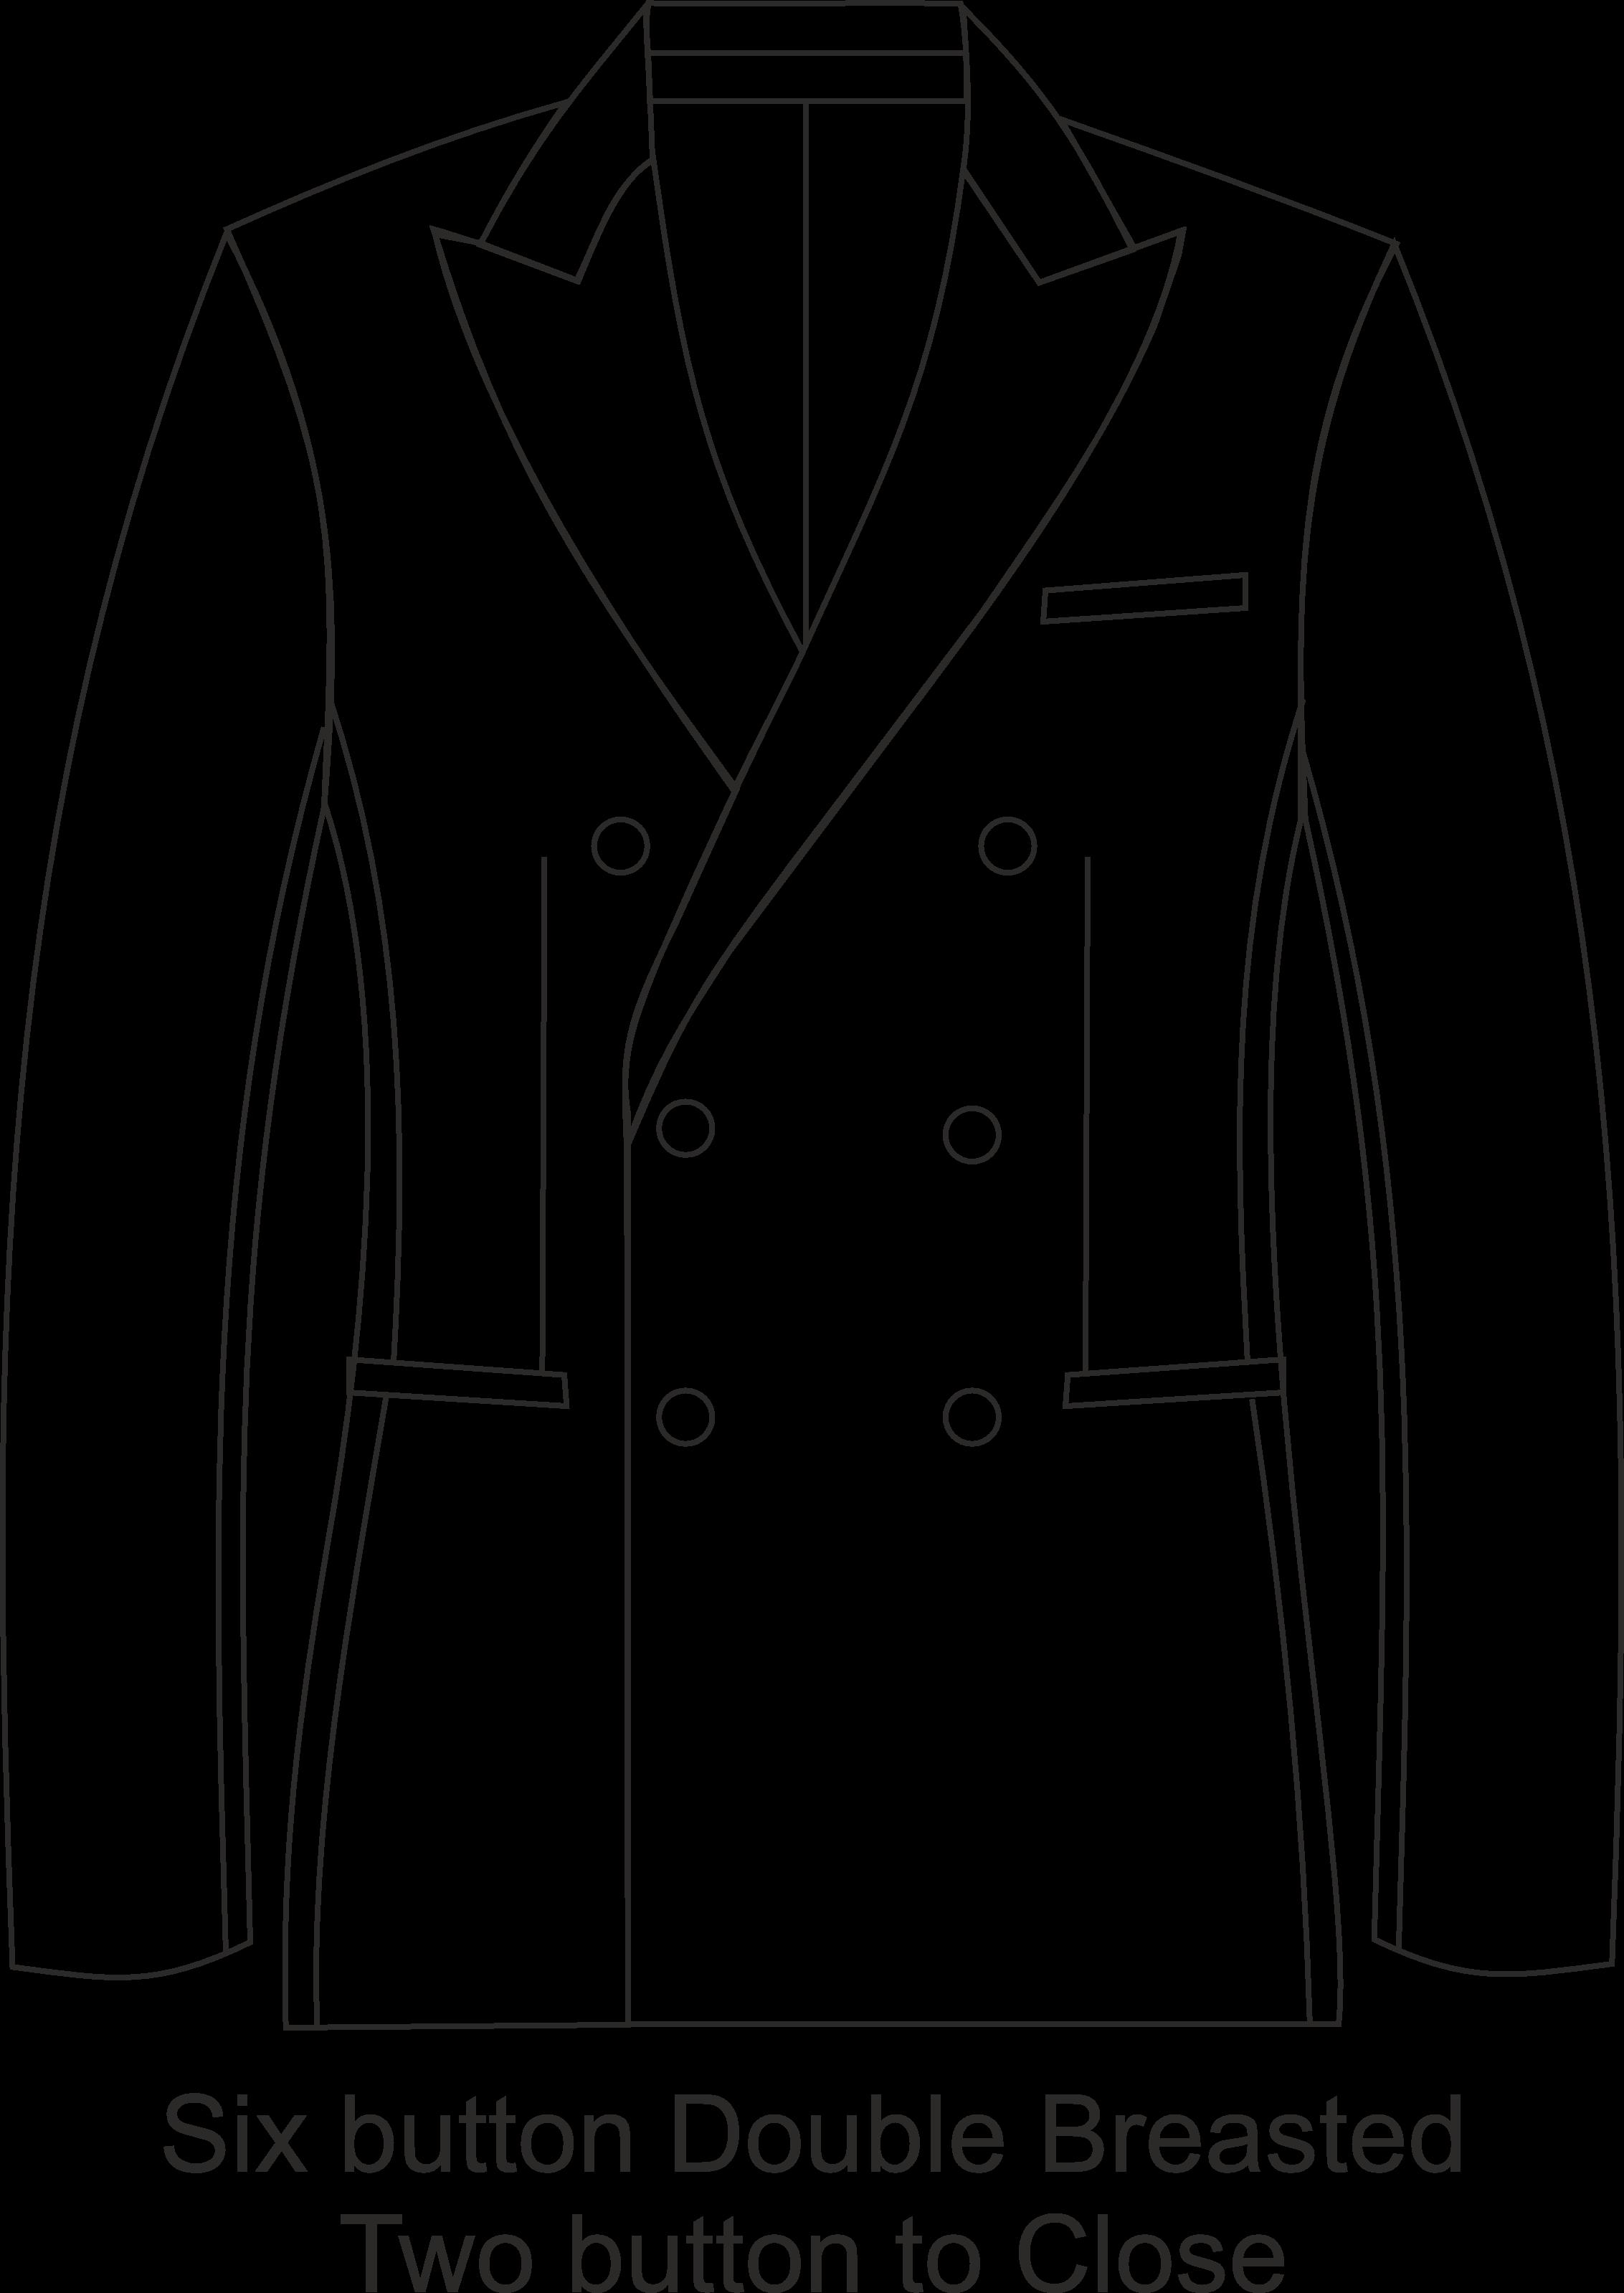 jacket-6bdb2tb